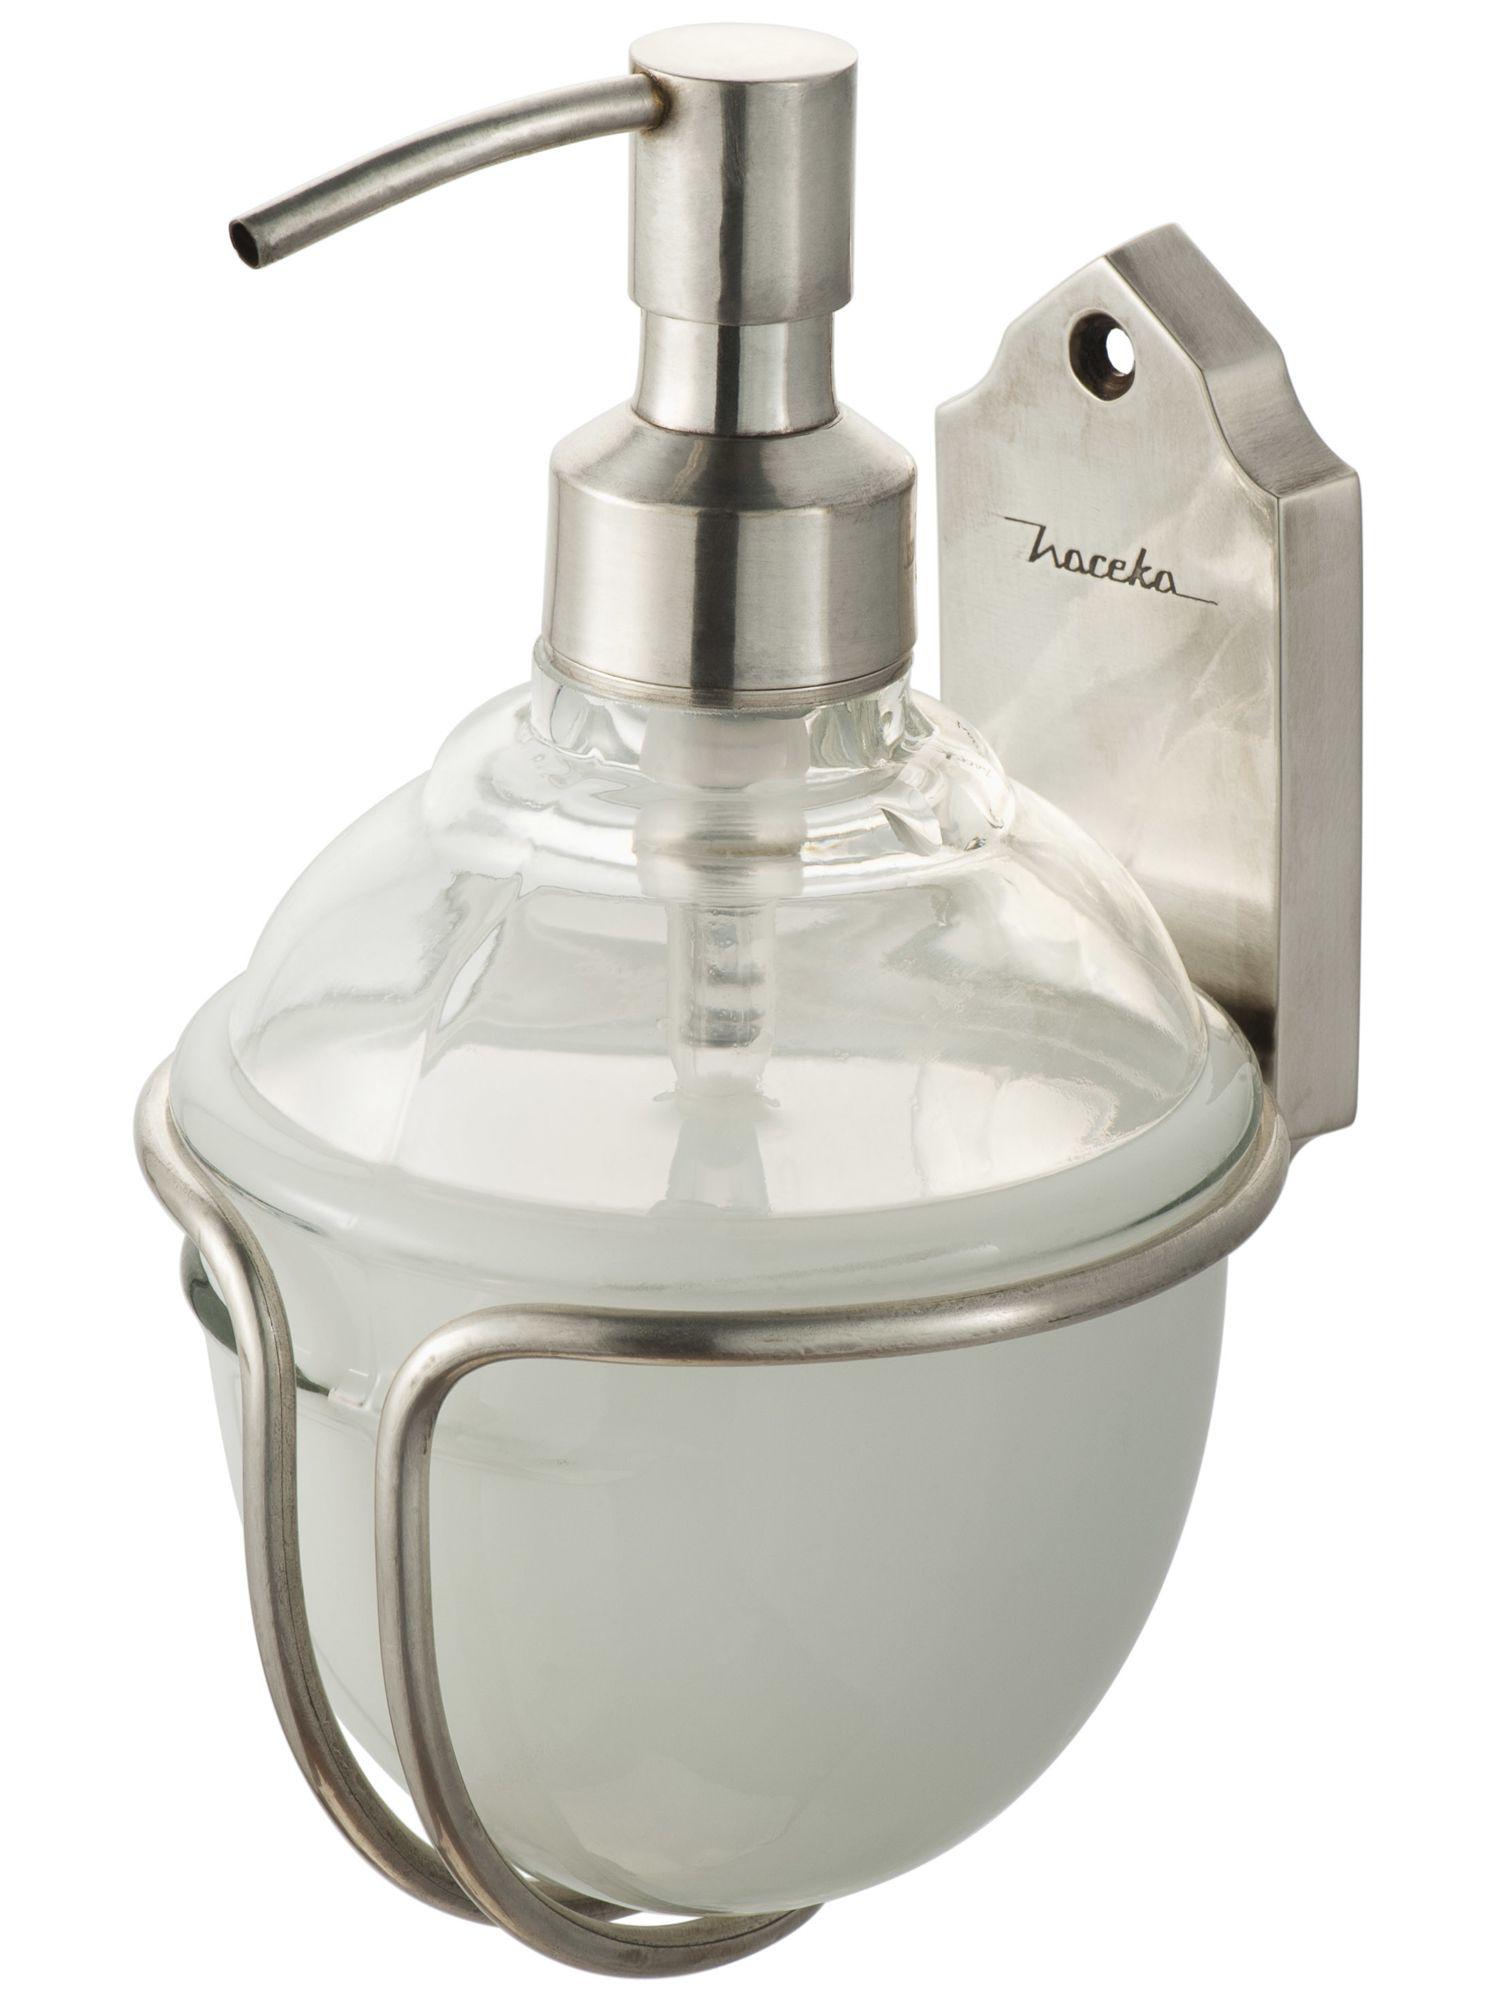 Aqualux Haceka Vintage Soap Dispenser 1170896 Soap Dispenser Wall Soap Dispenser Wall